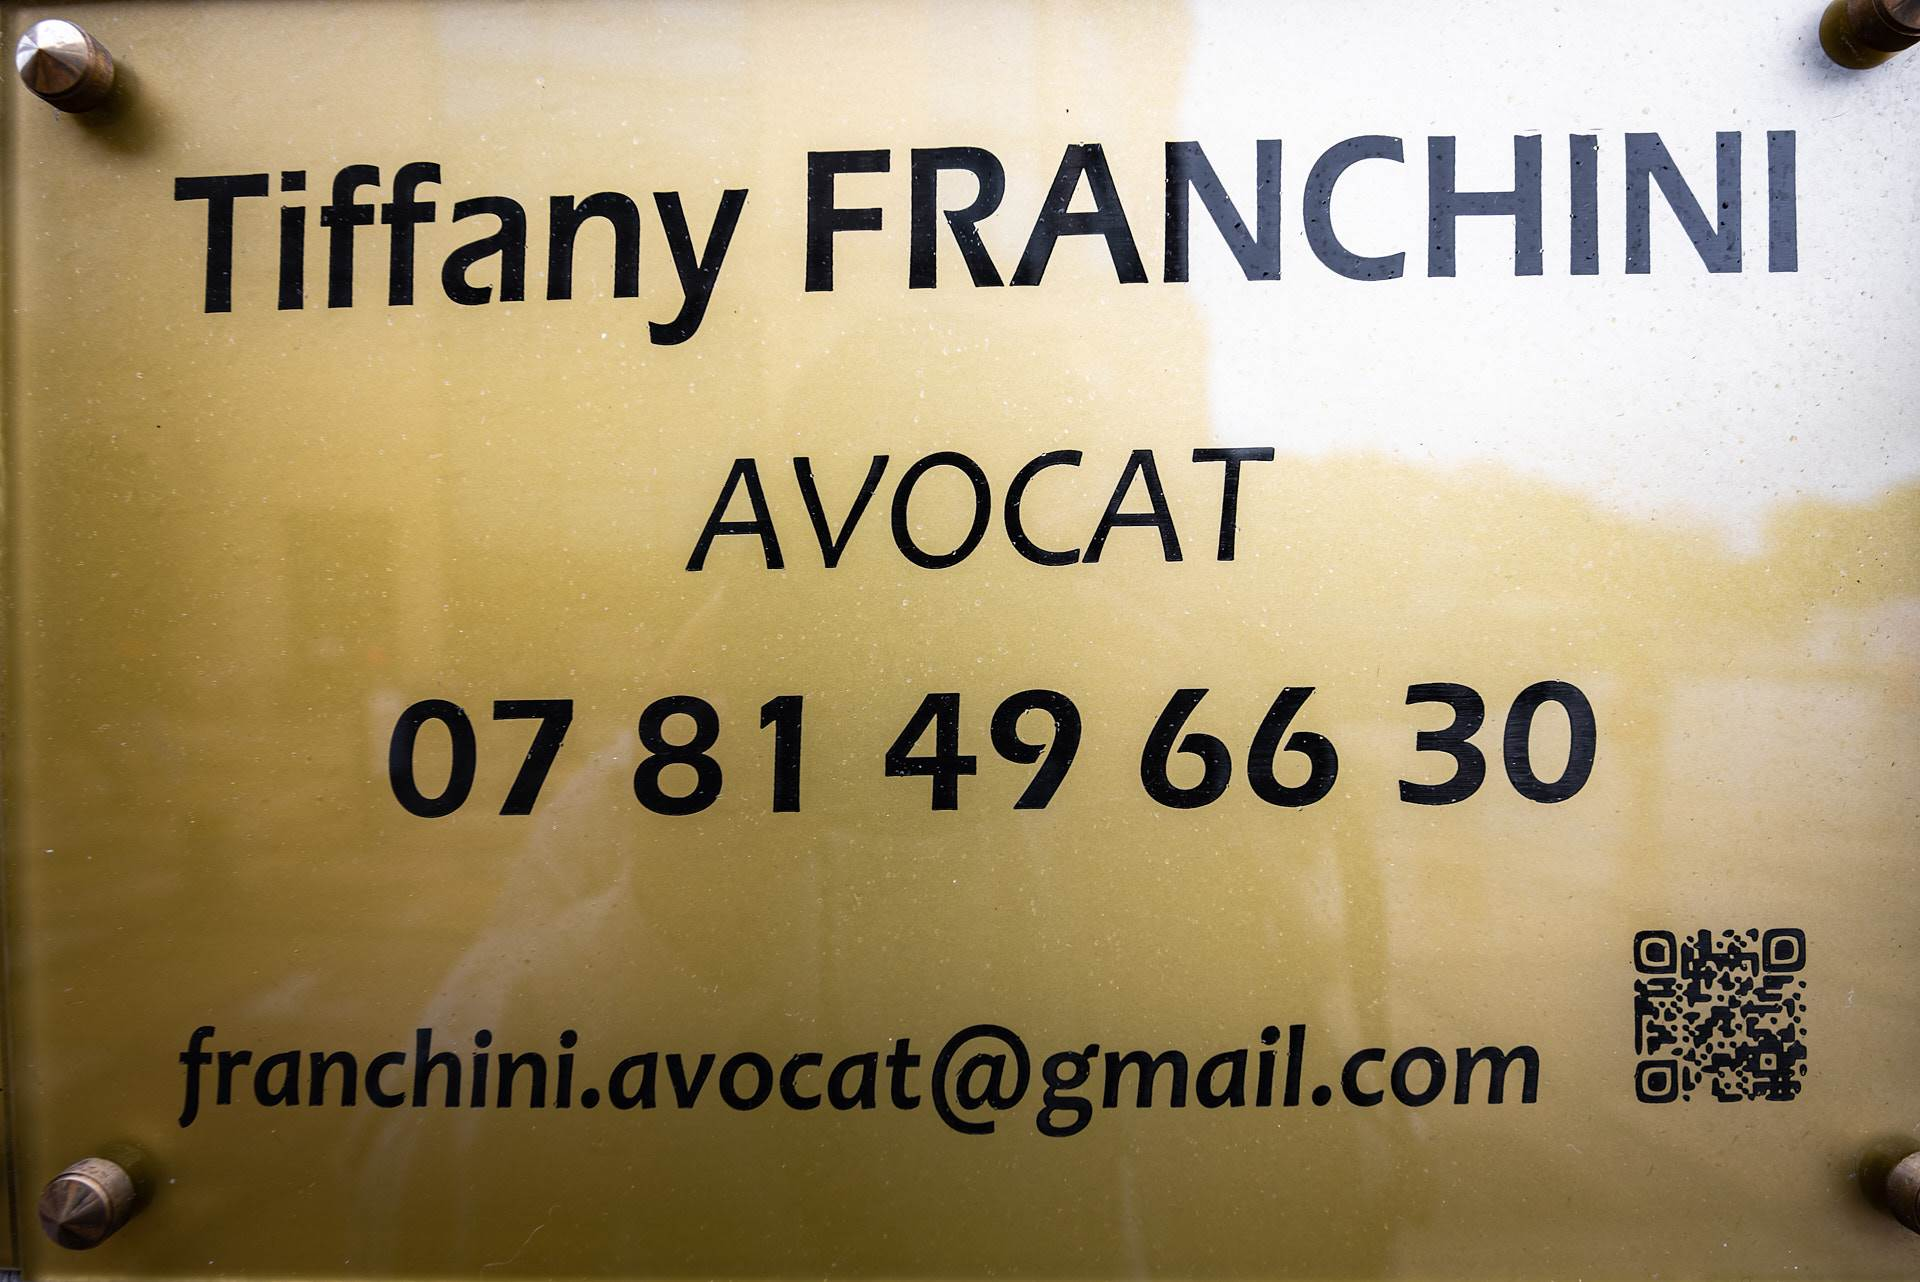 Franchini_Avocat (67)